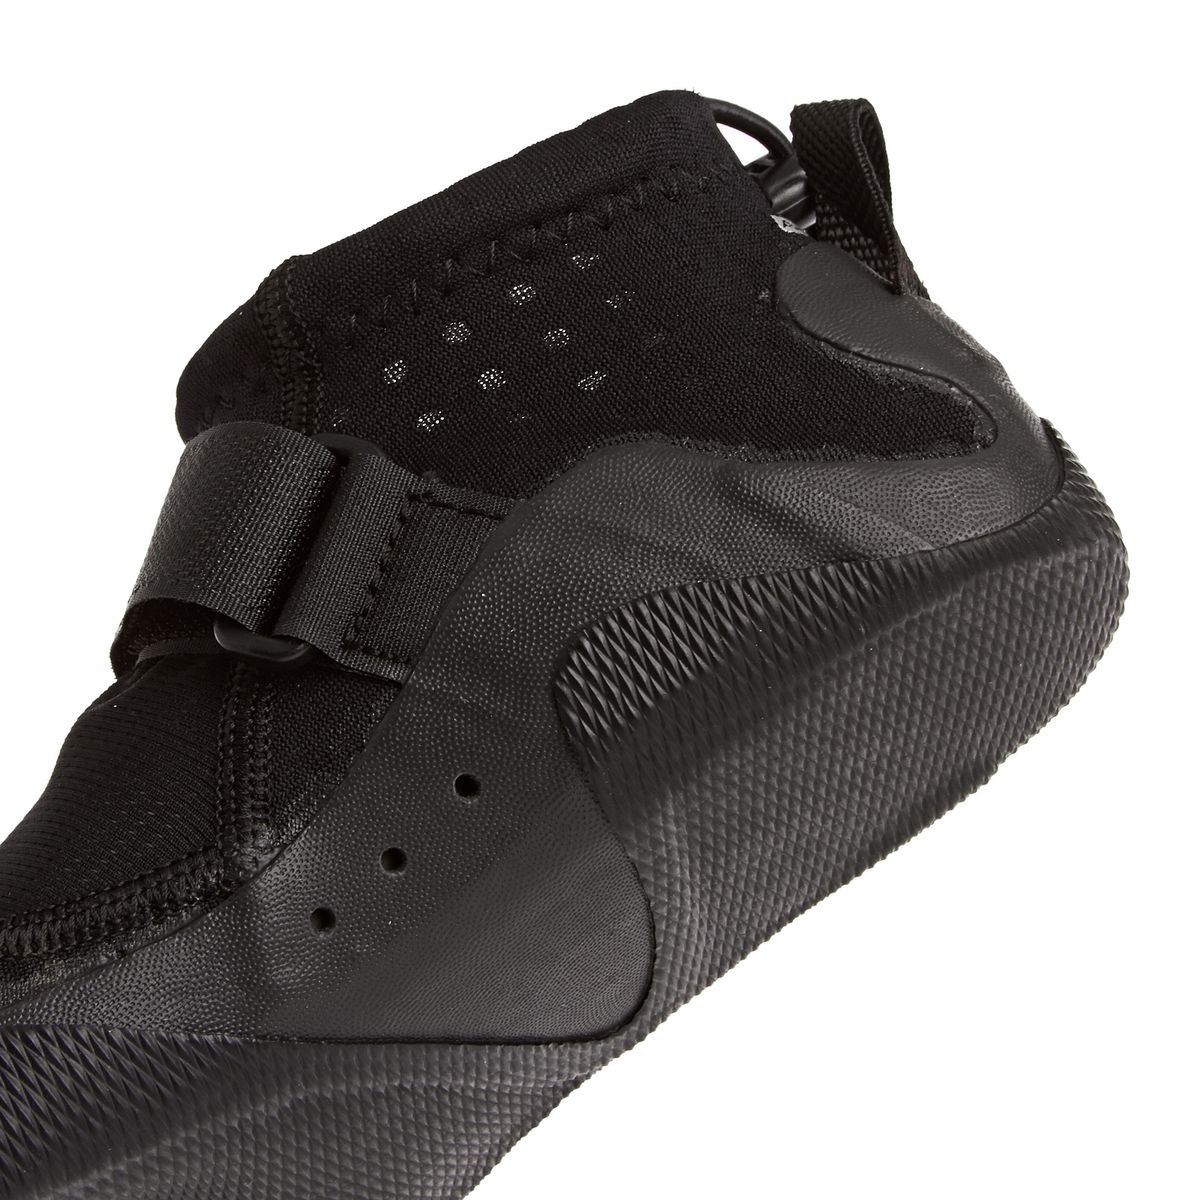 Rip Curl Core Reefer 15mm Split Toe Wetsuit Boots UK 9 Black